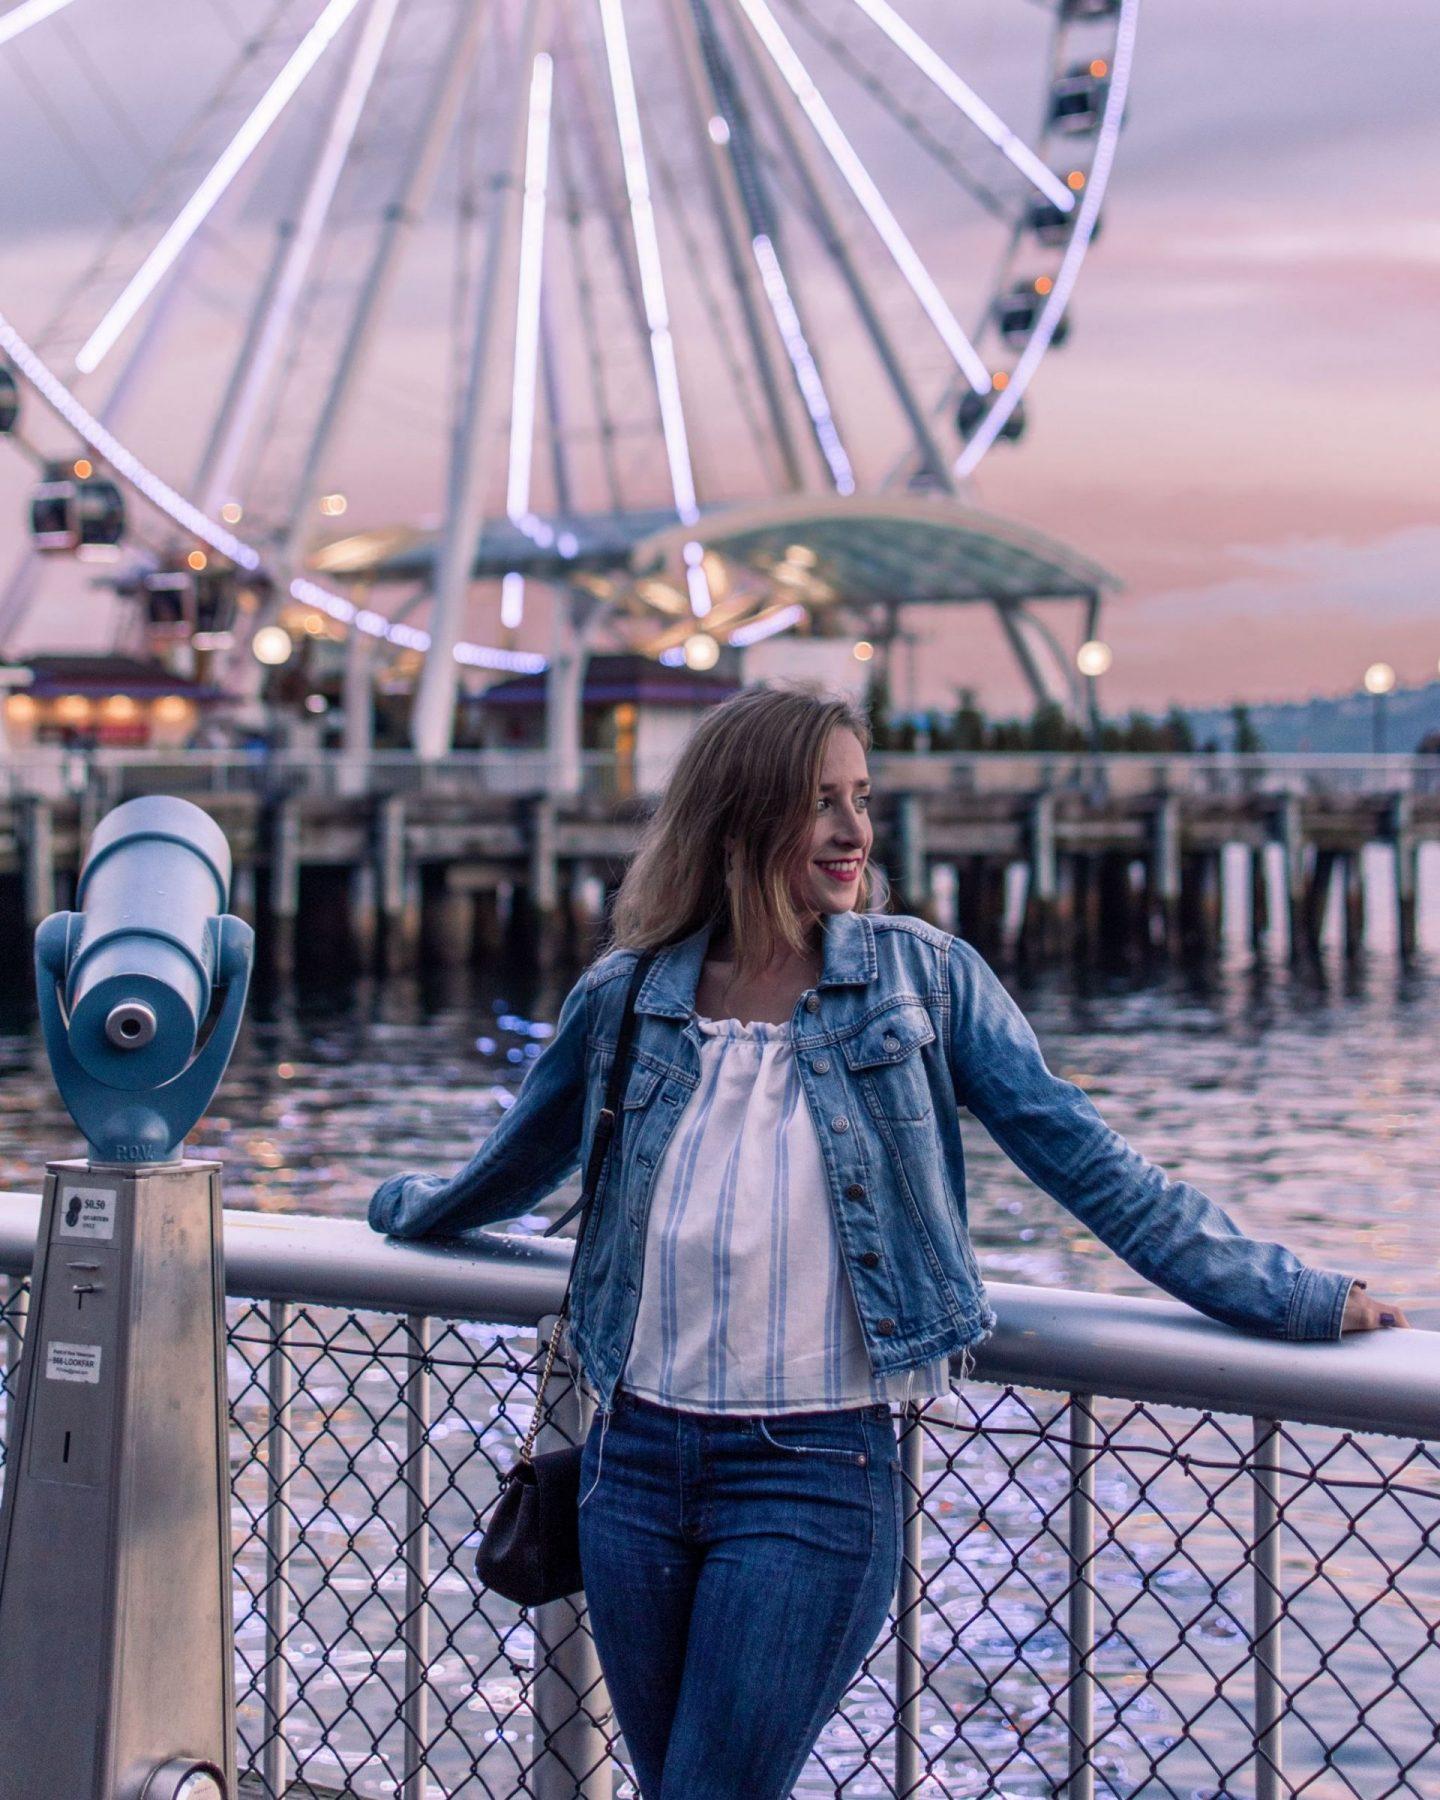 seattle ferris wheel at sunset